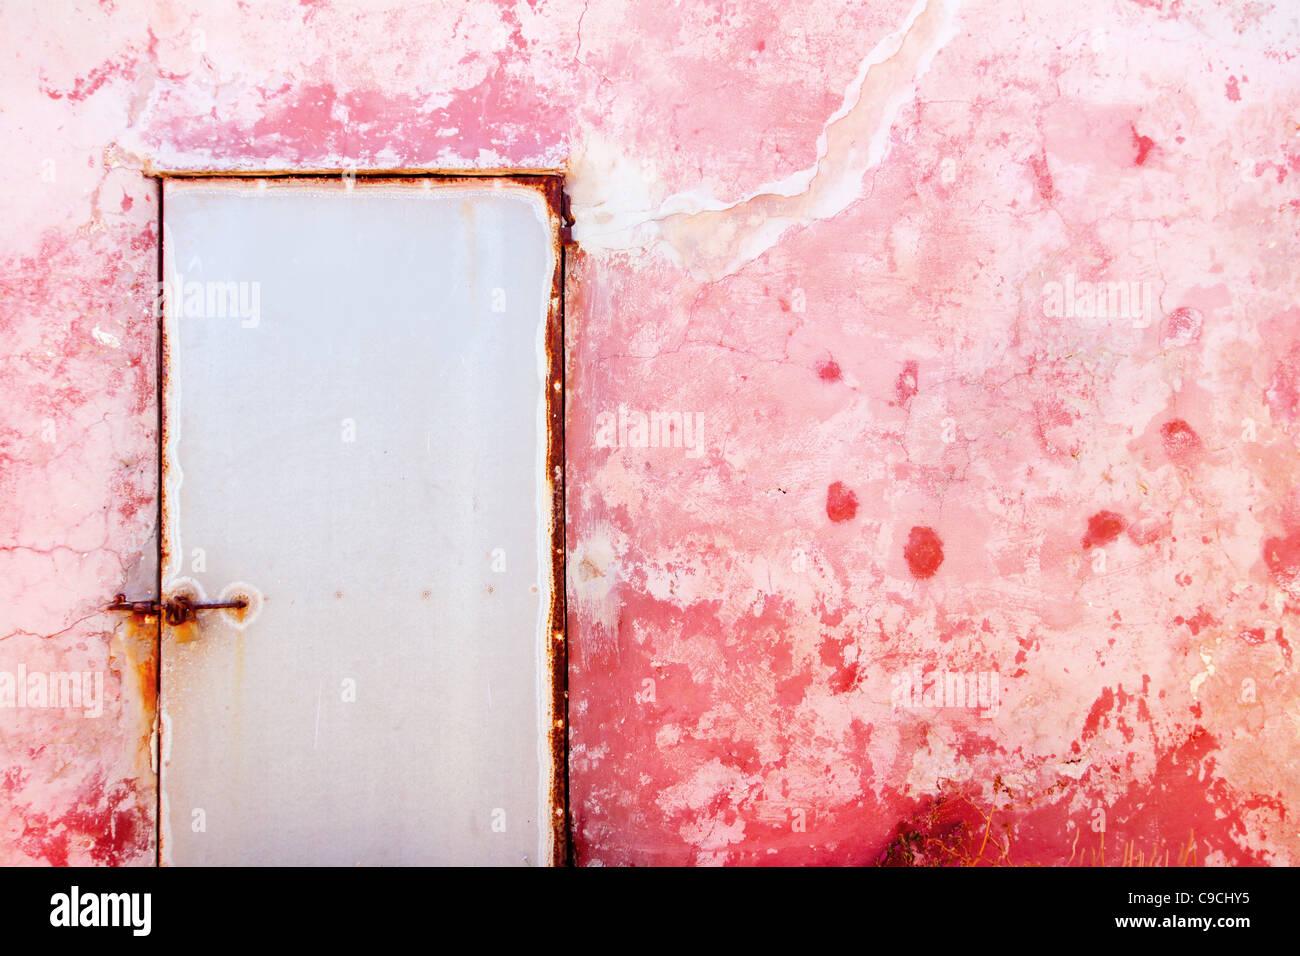 Méditerranée rose grunge porte et mur avec texture weathered Photo Stock